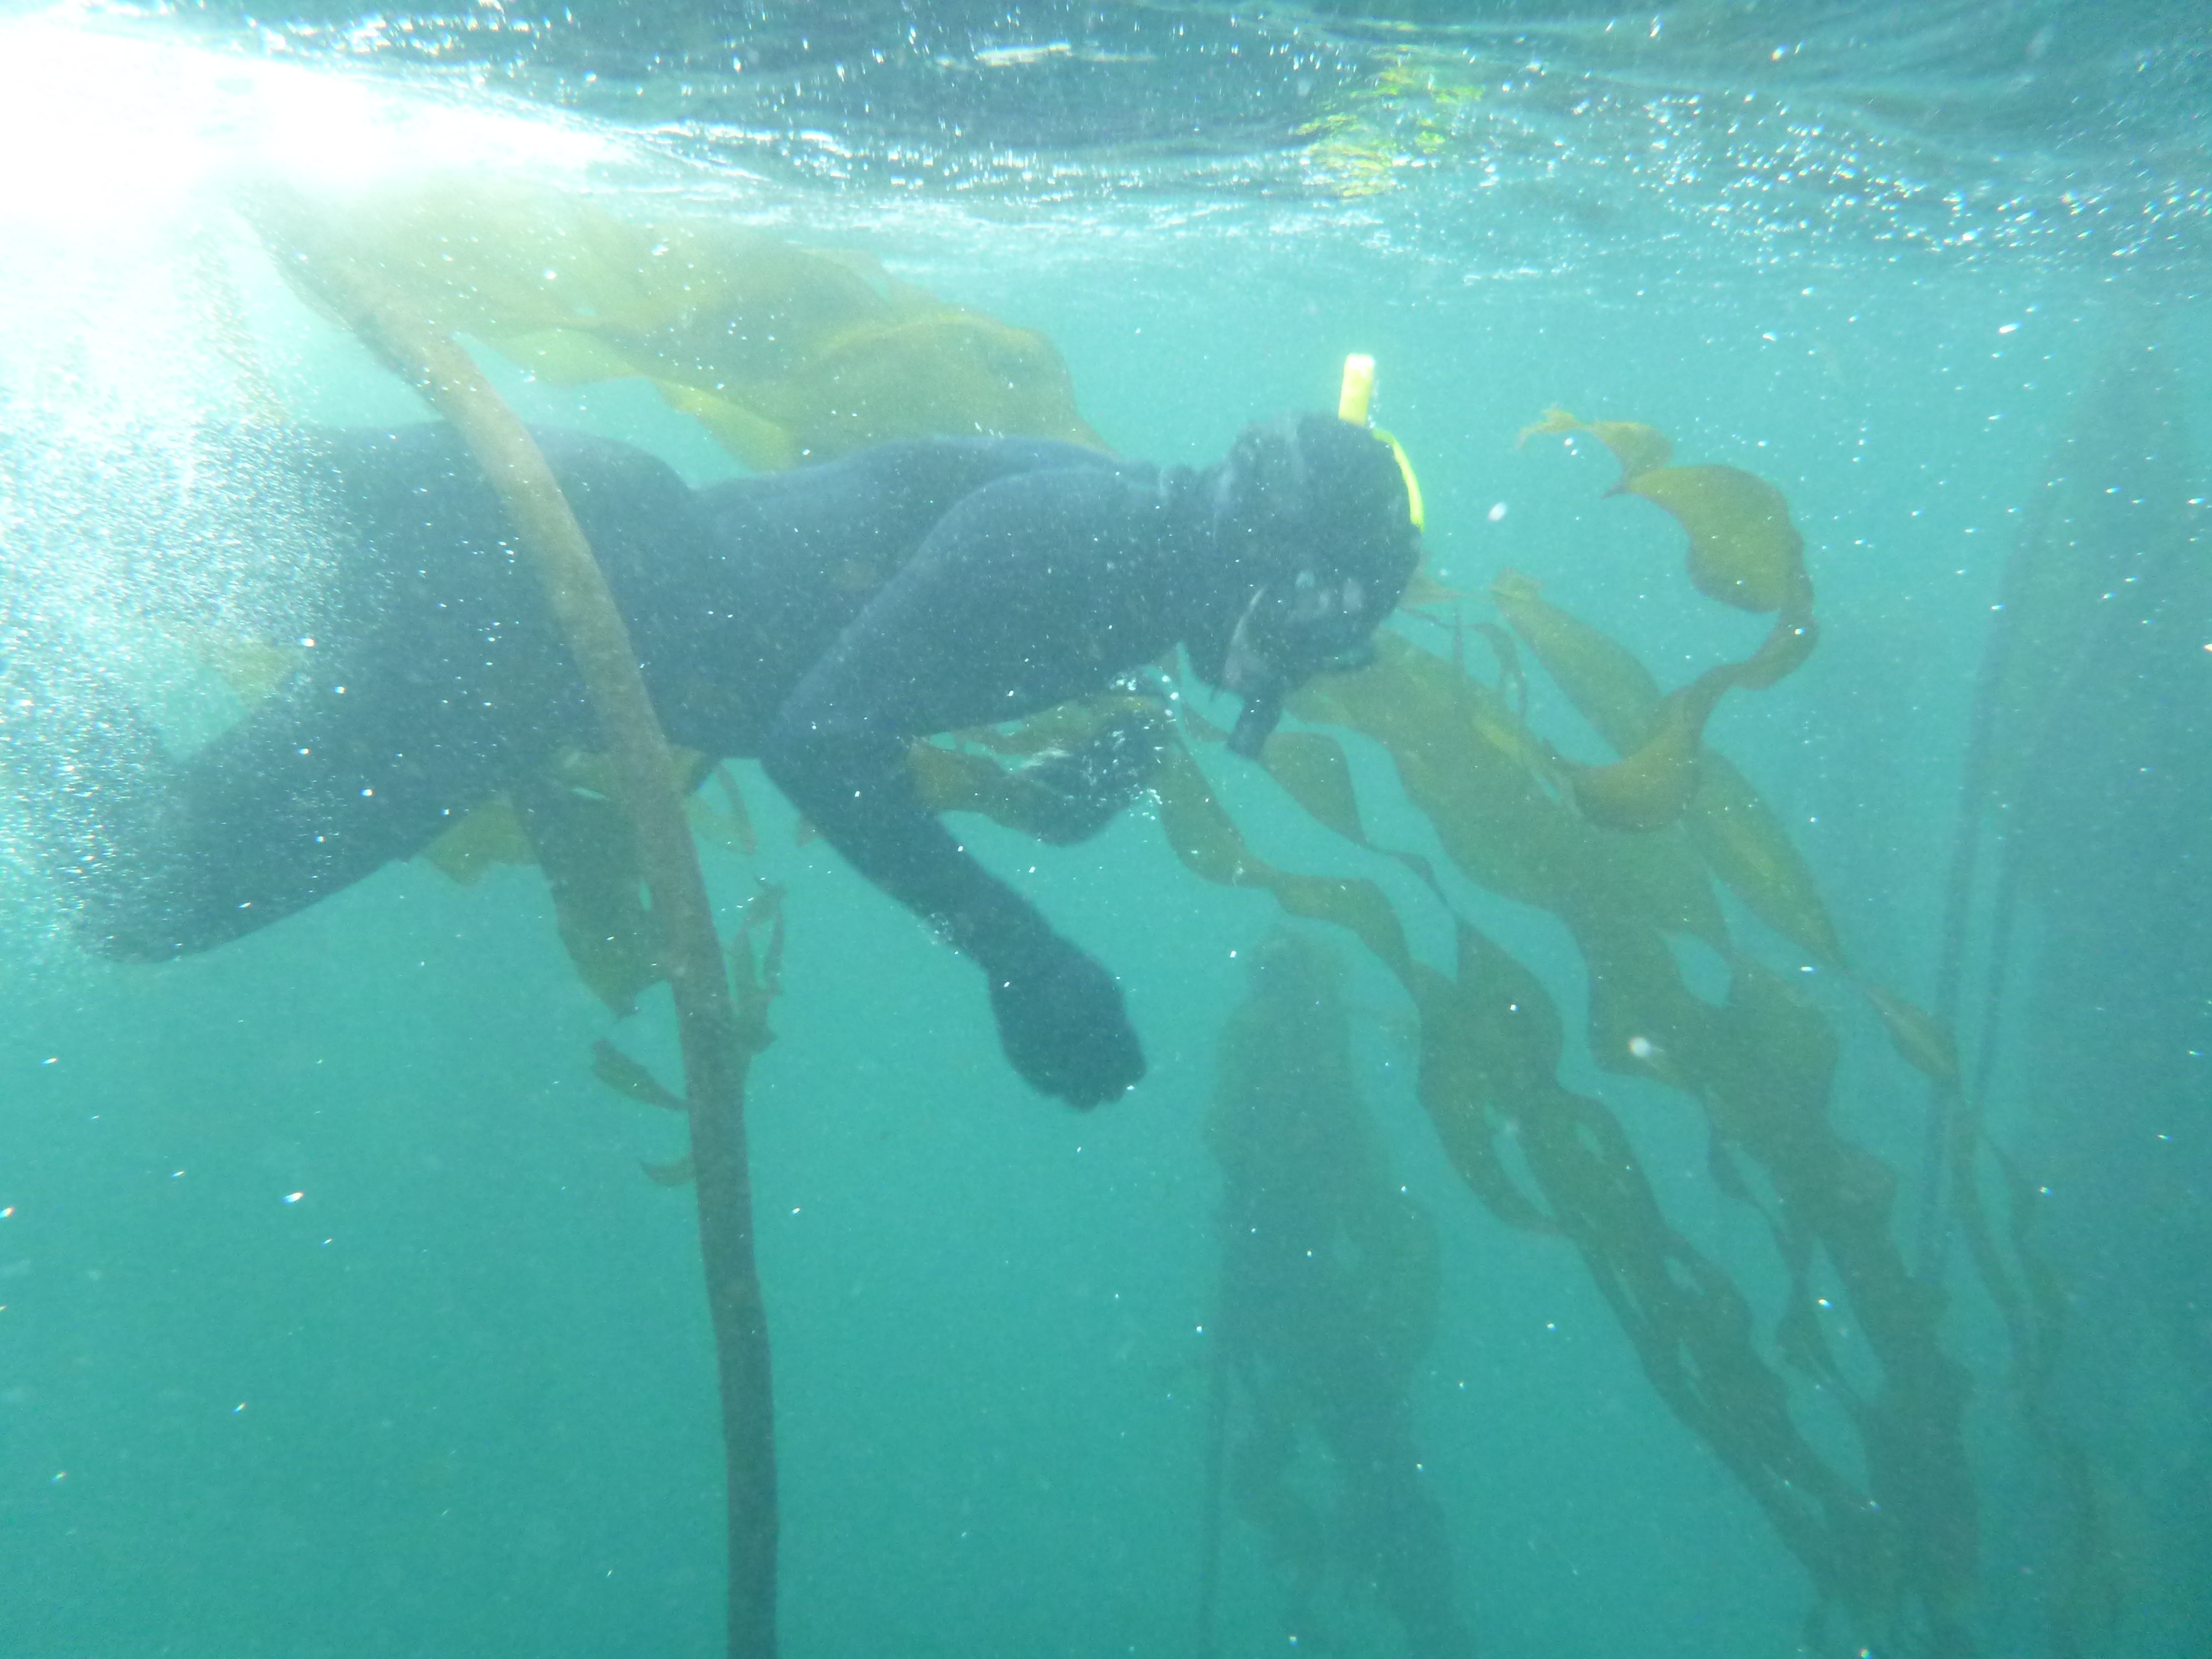 Cross jellyfish | Pearson College Marine Science